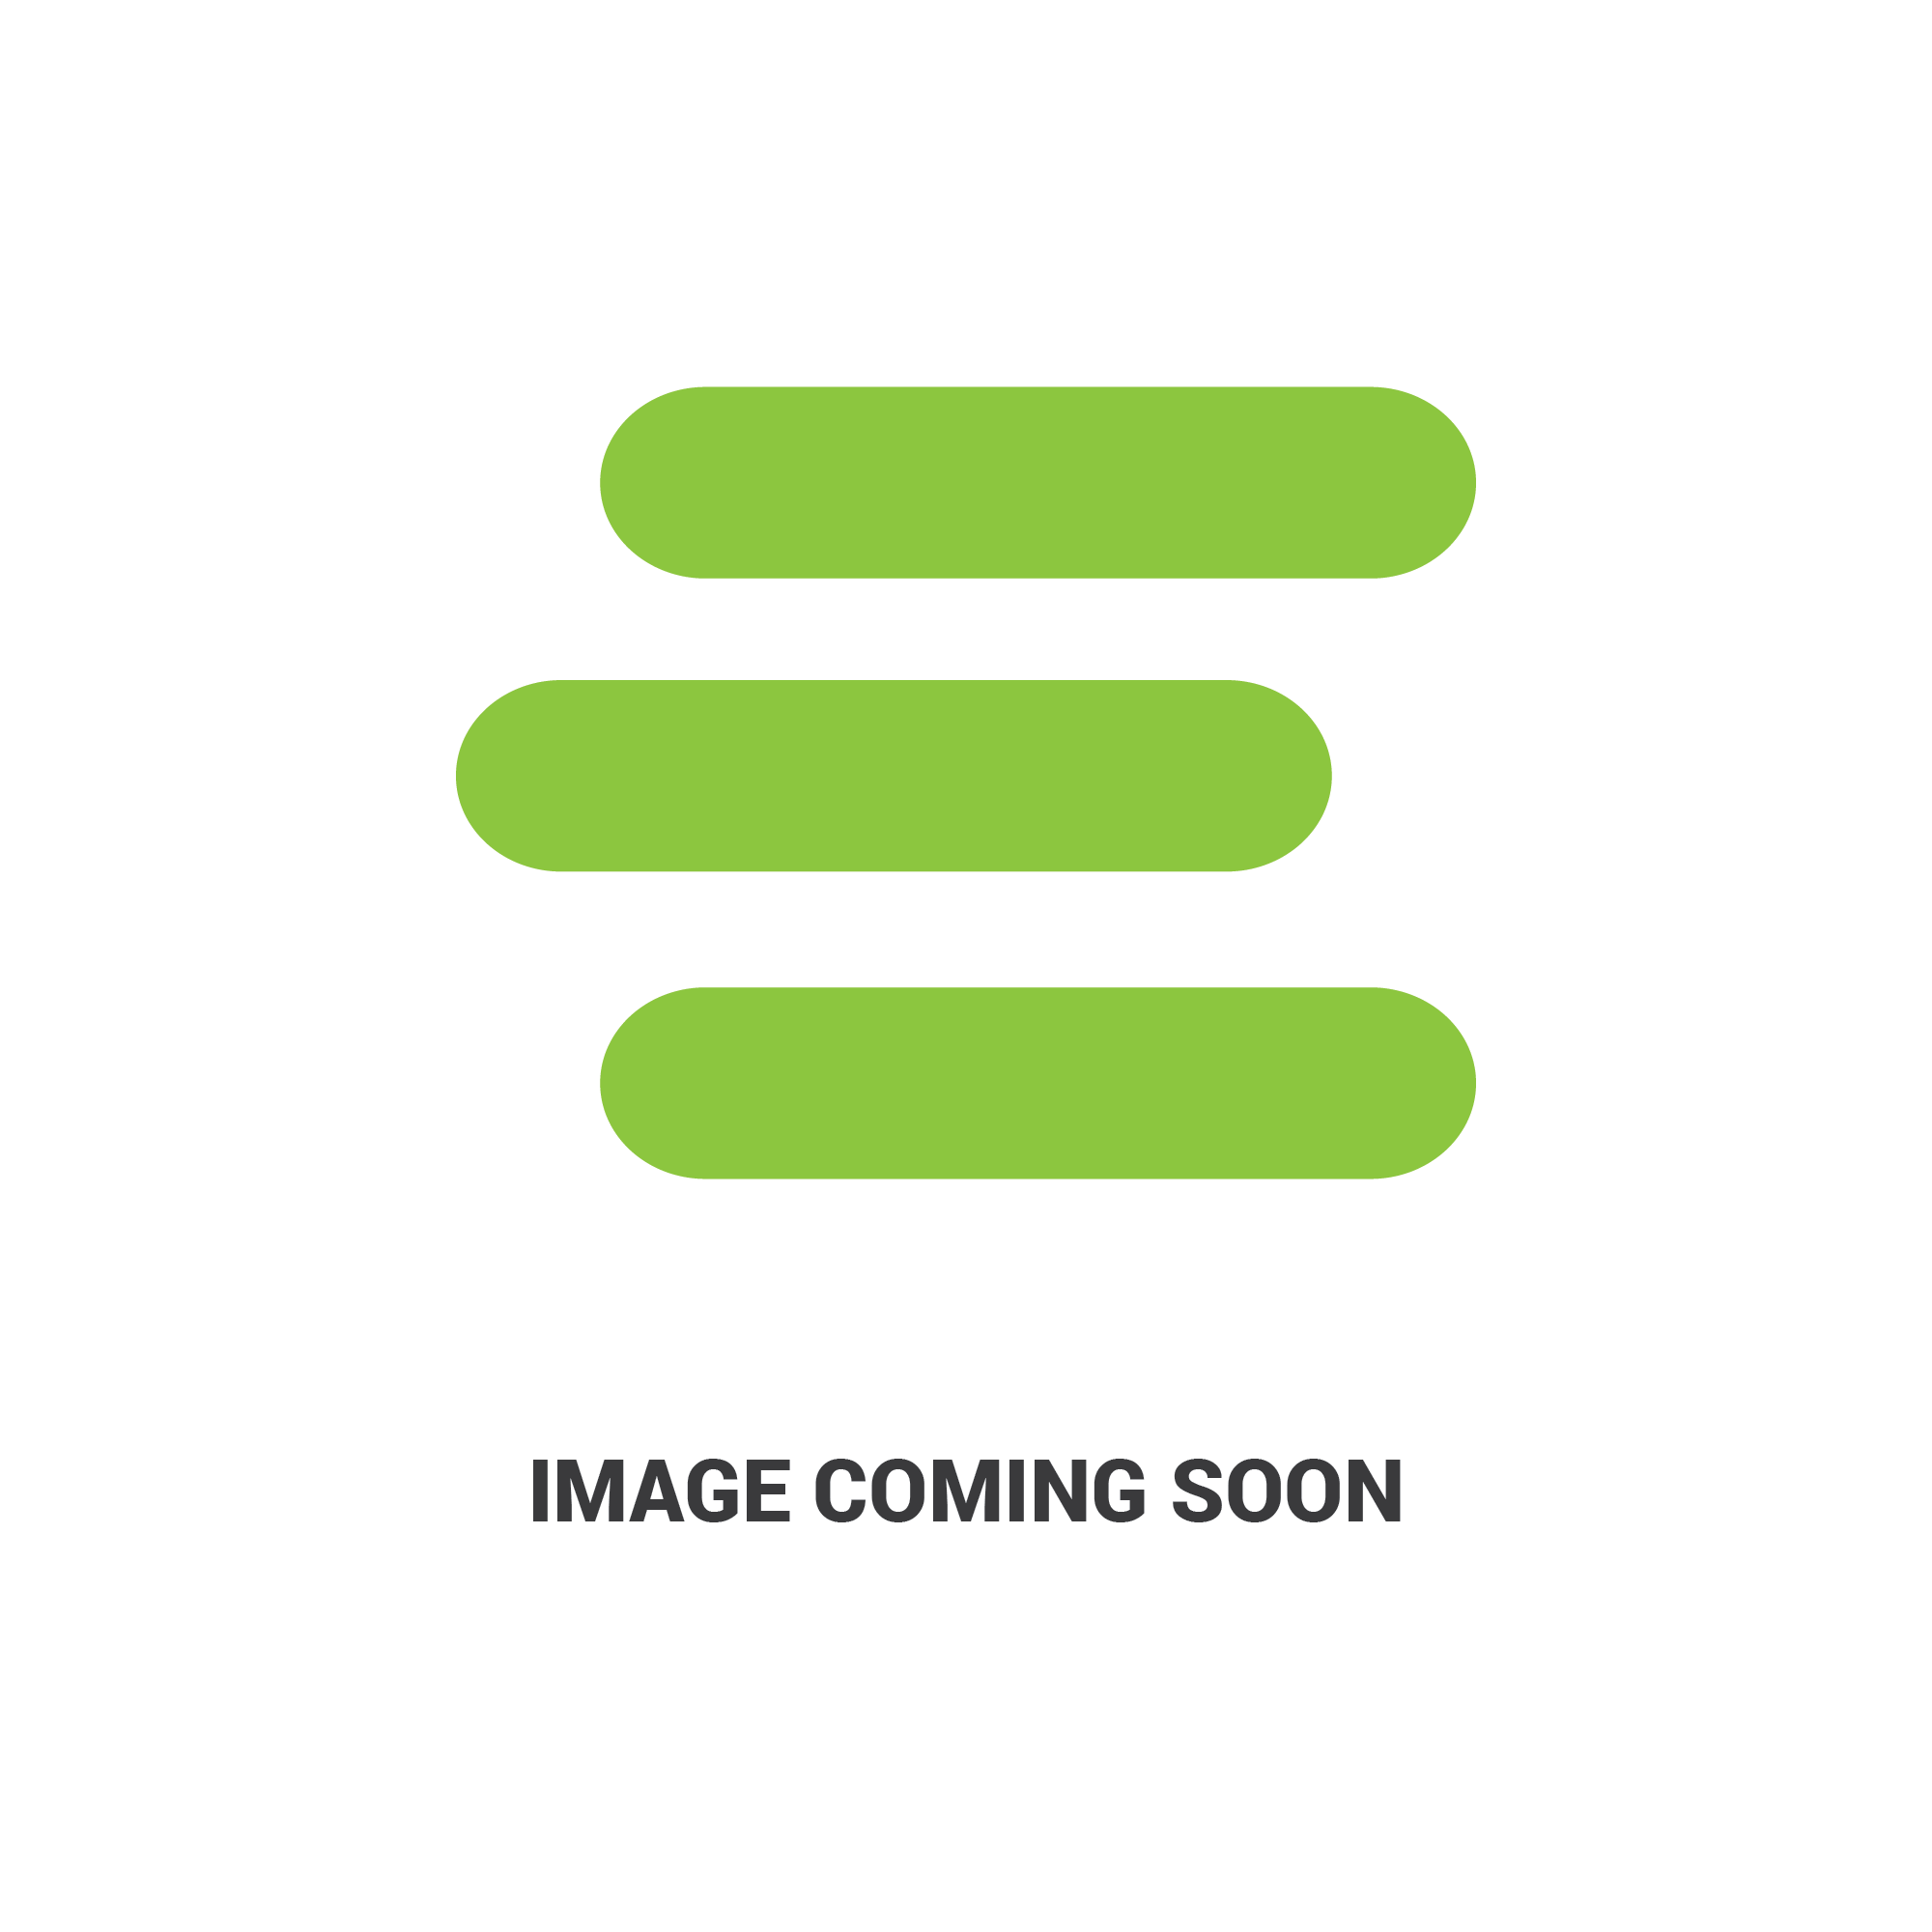 E-64552-000company info product photos10.jpg